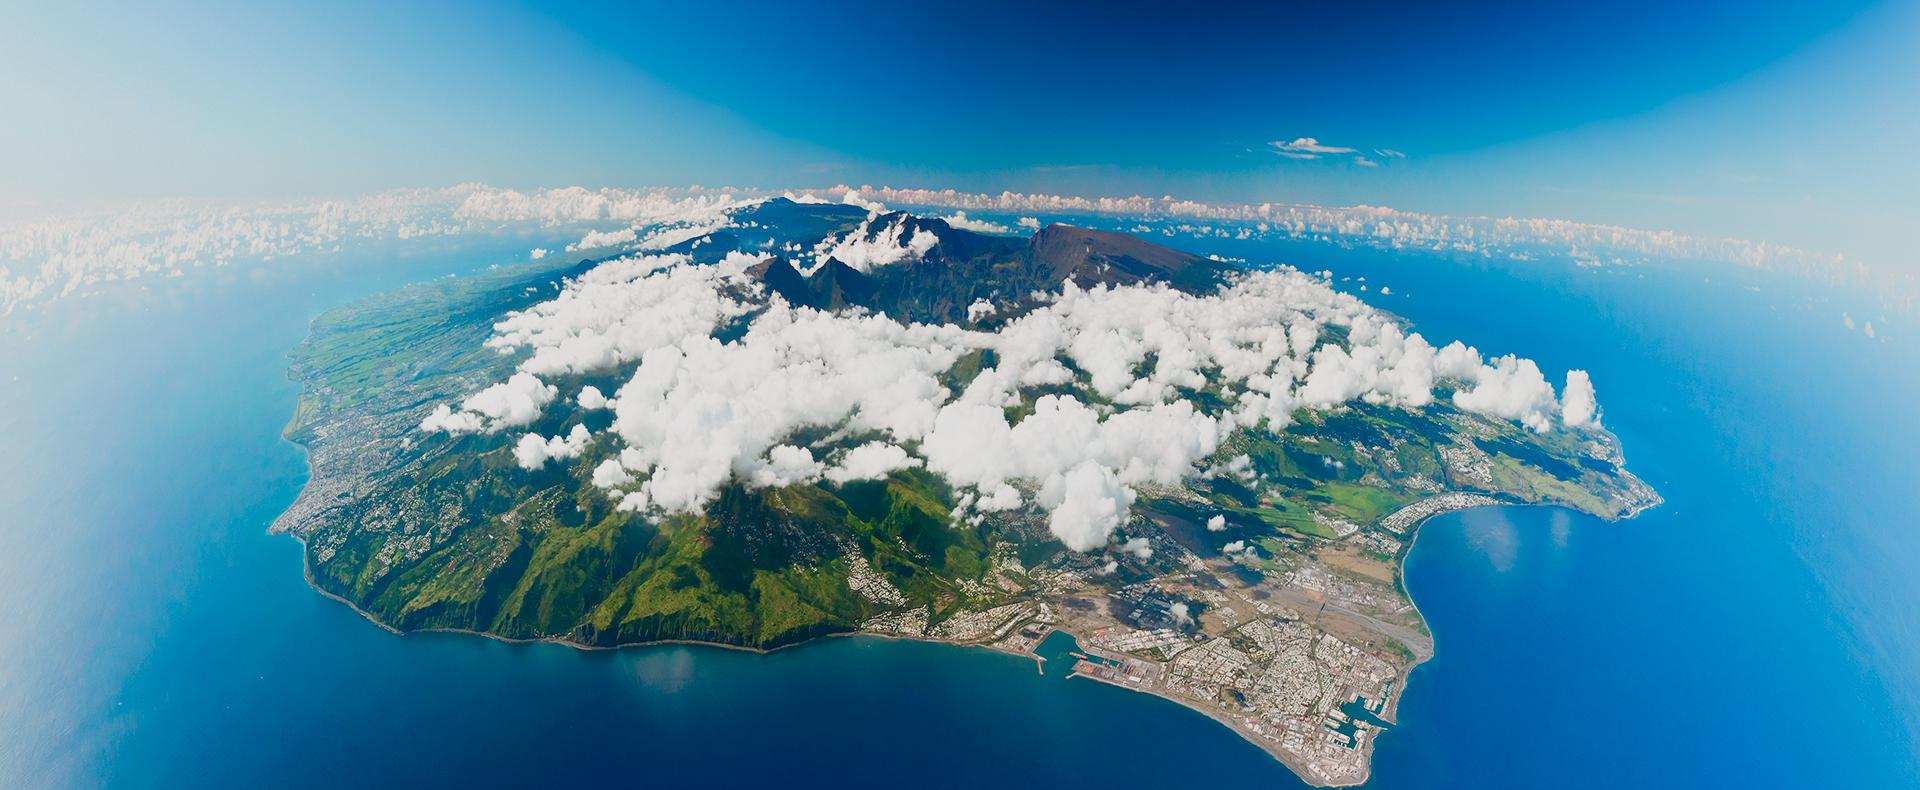 Majestueuse île de la Réunion